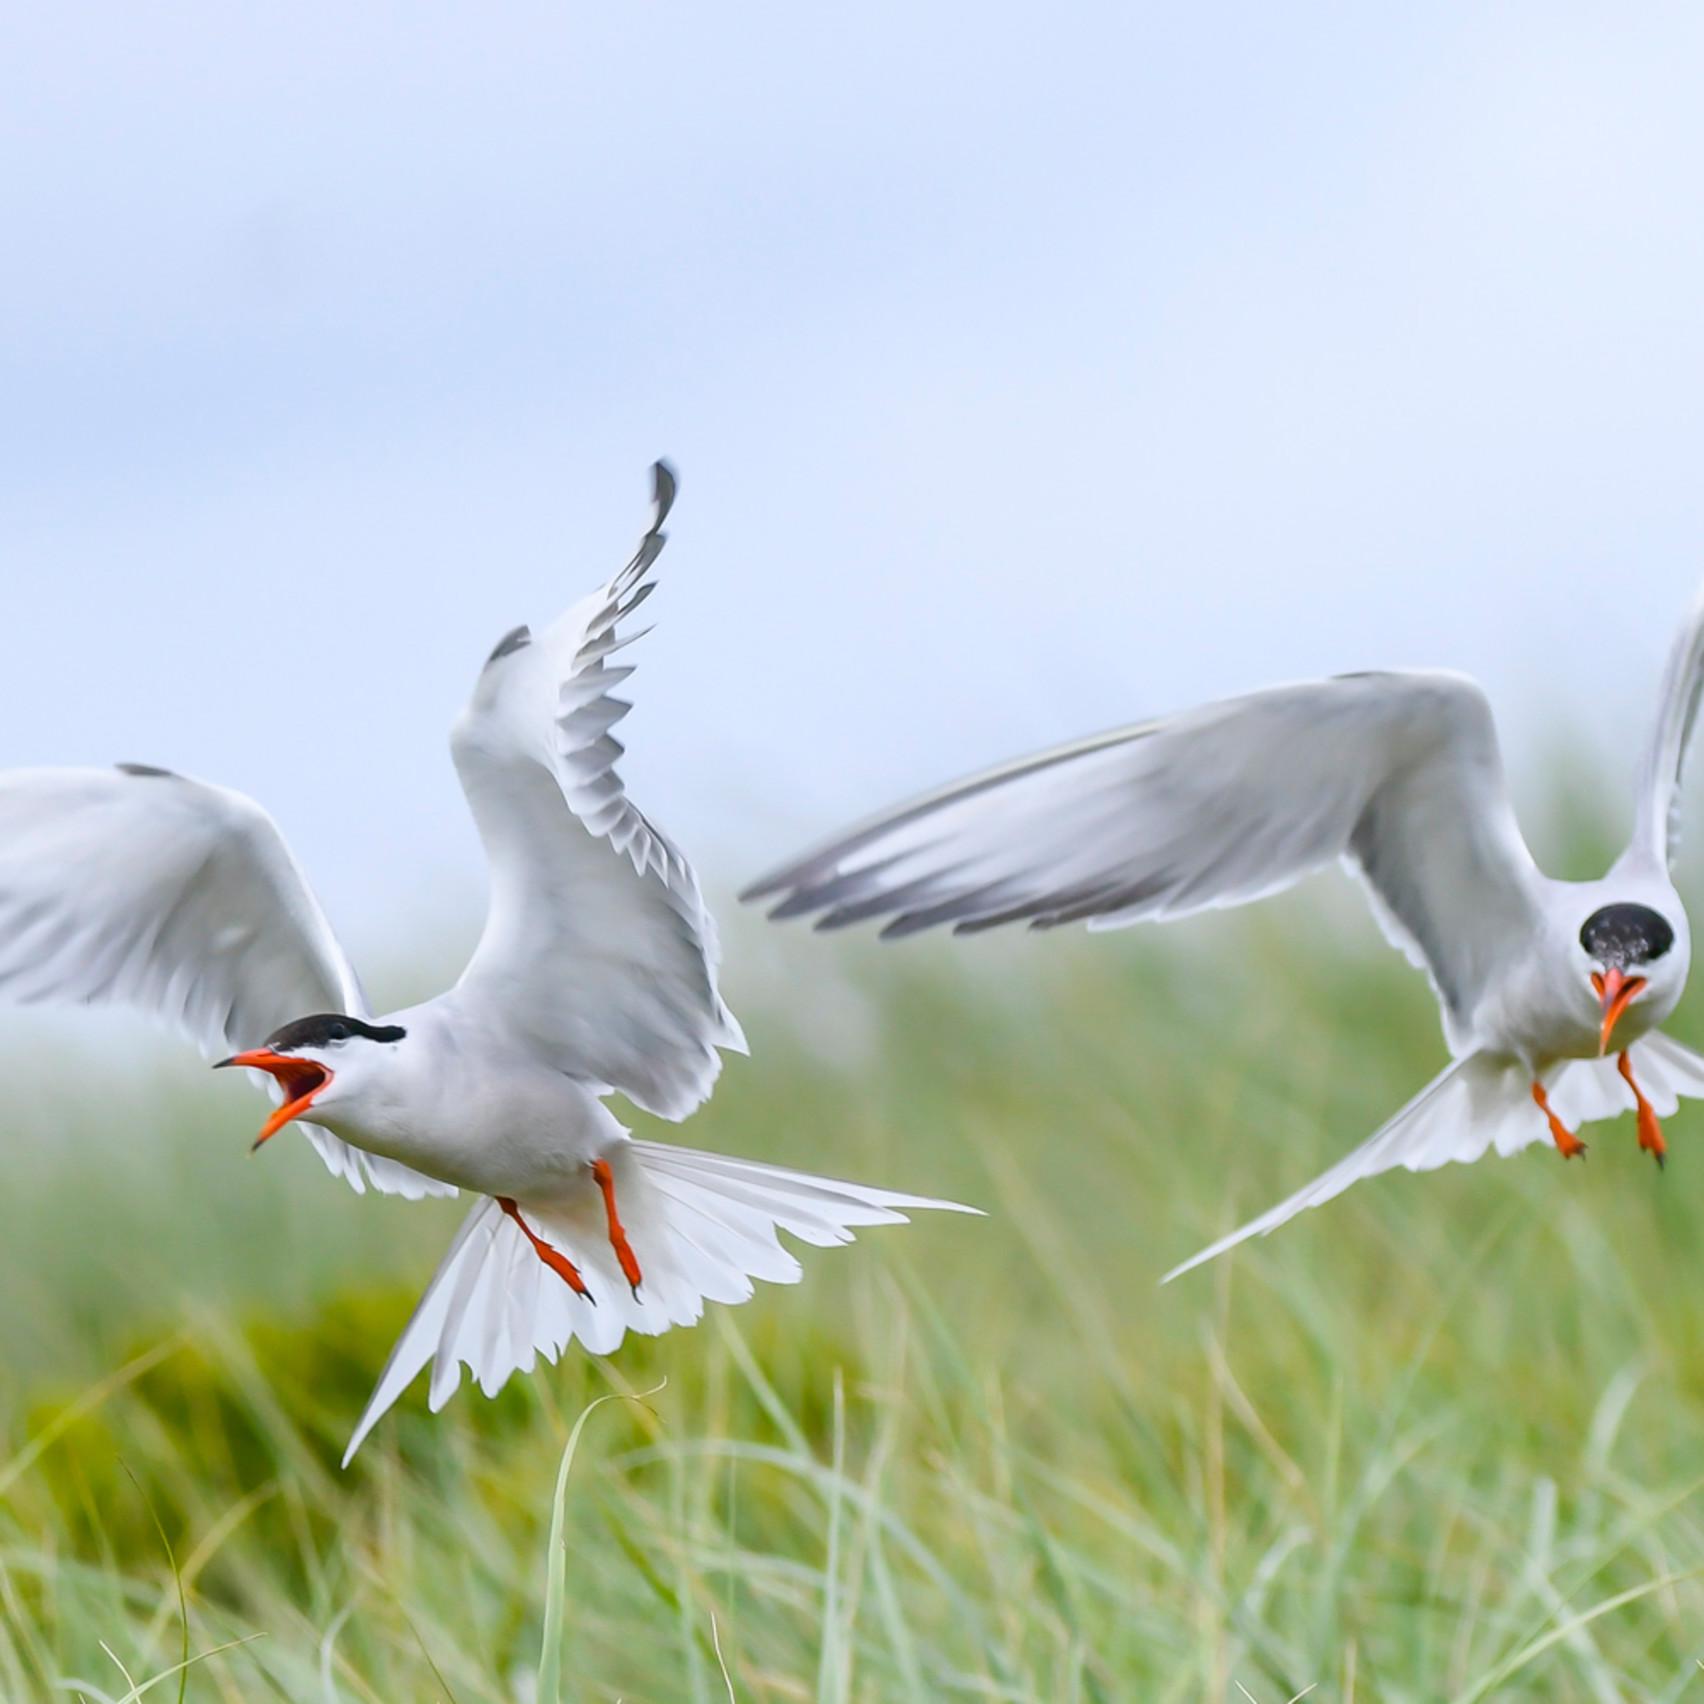 Common terns in flight 2 eaqoz8